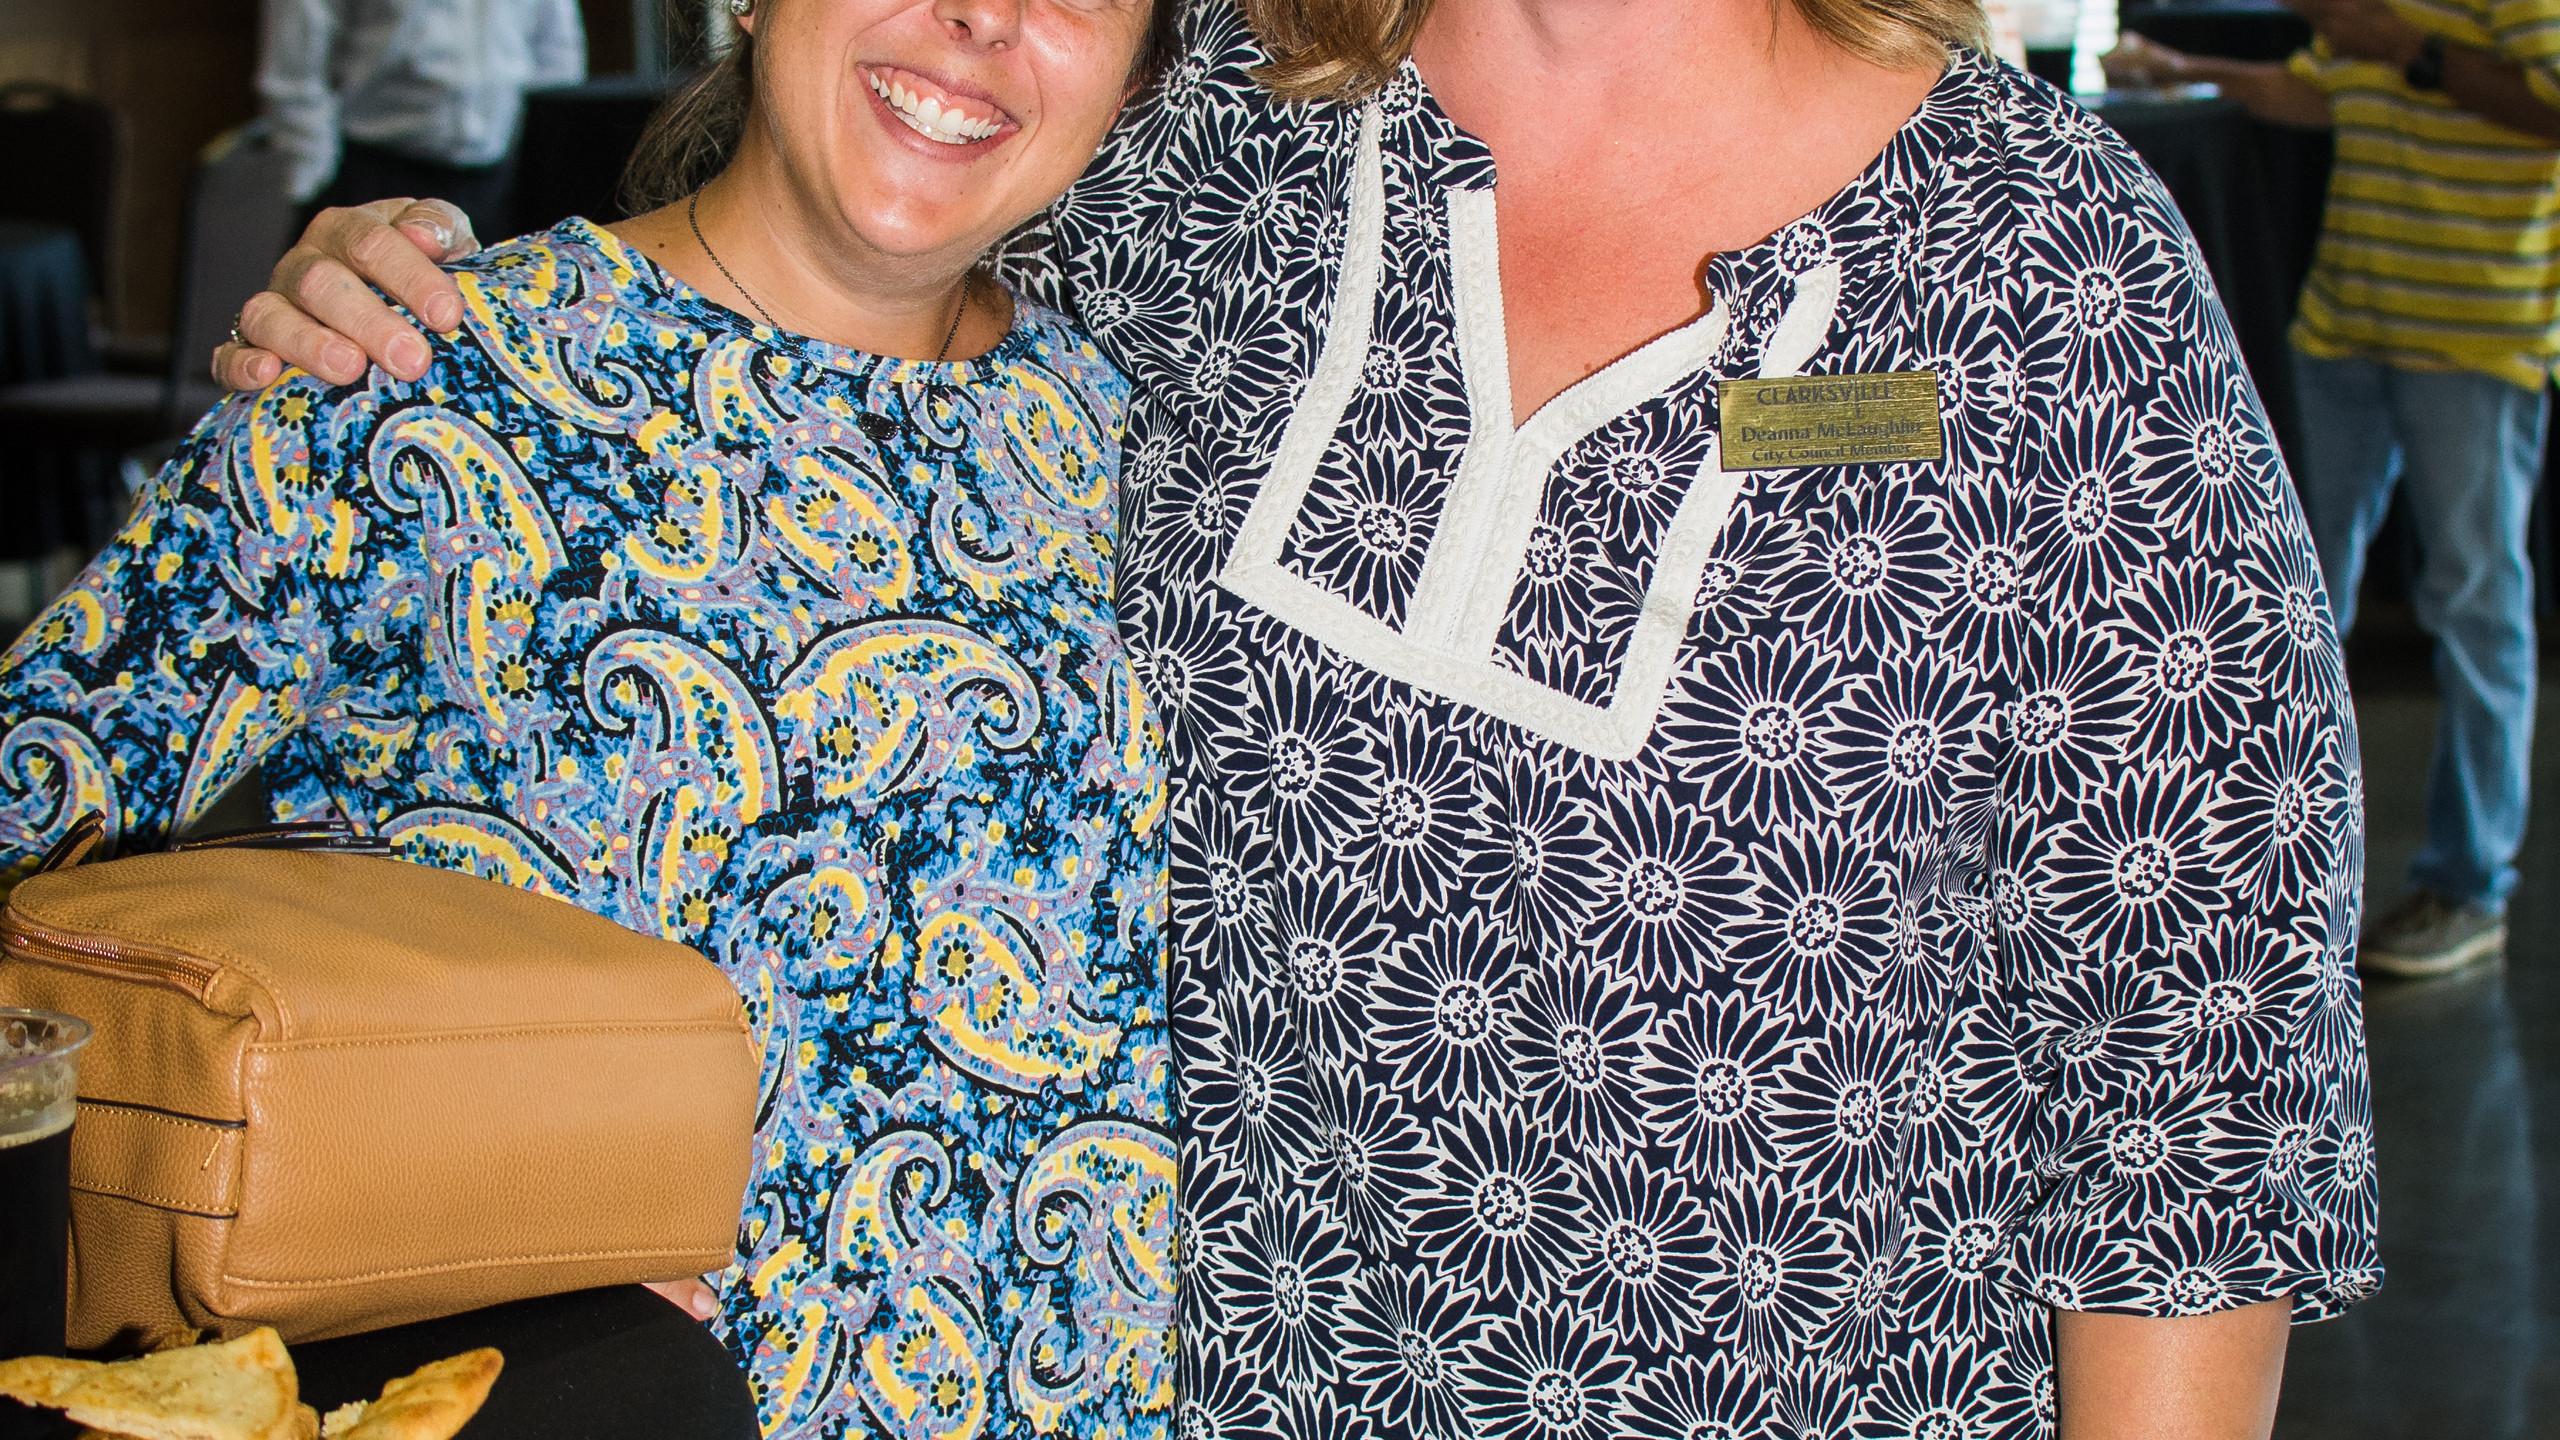 Paula Atkins and Deanna McLaughlin